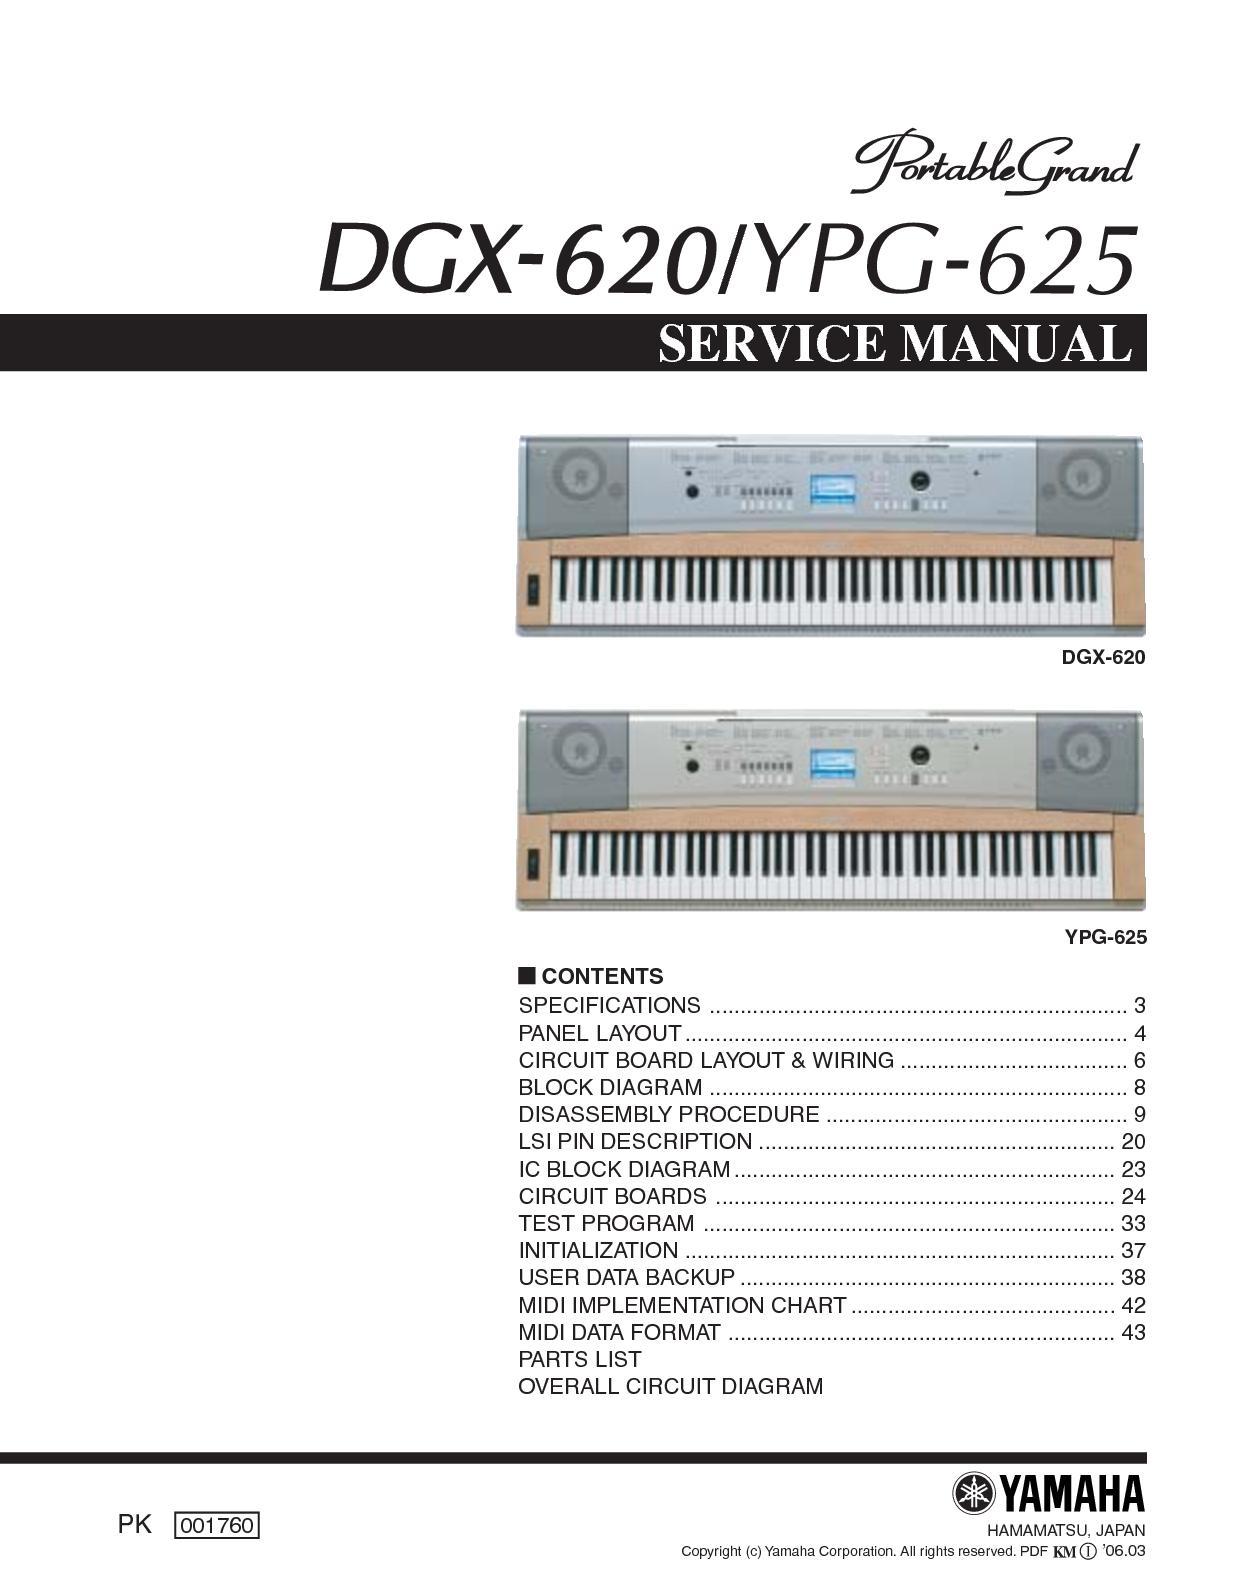 Calamo Yamaha Dgx 620 Ypg 625 Service Manual Usb Midi Wiring Diagram